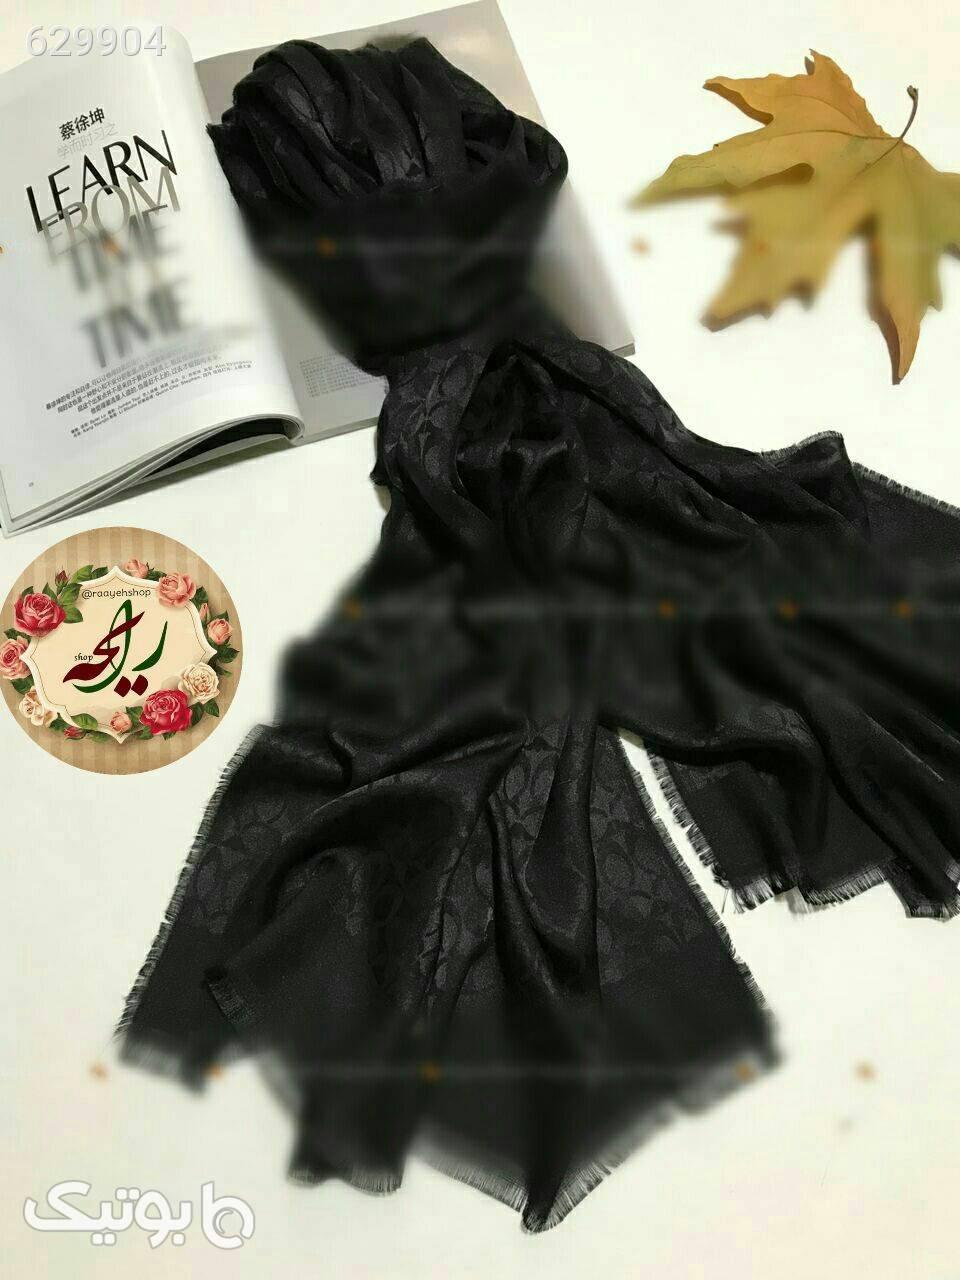 شال ابریشمی مشکی شال و روسری